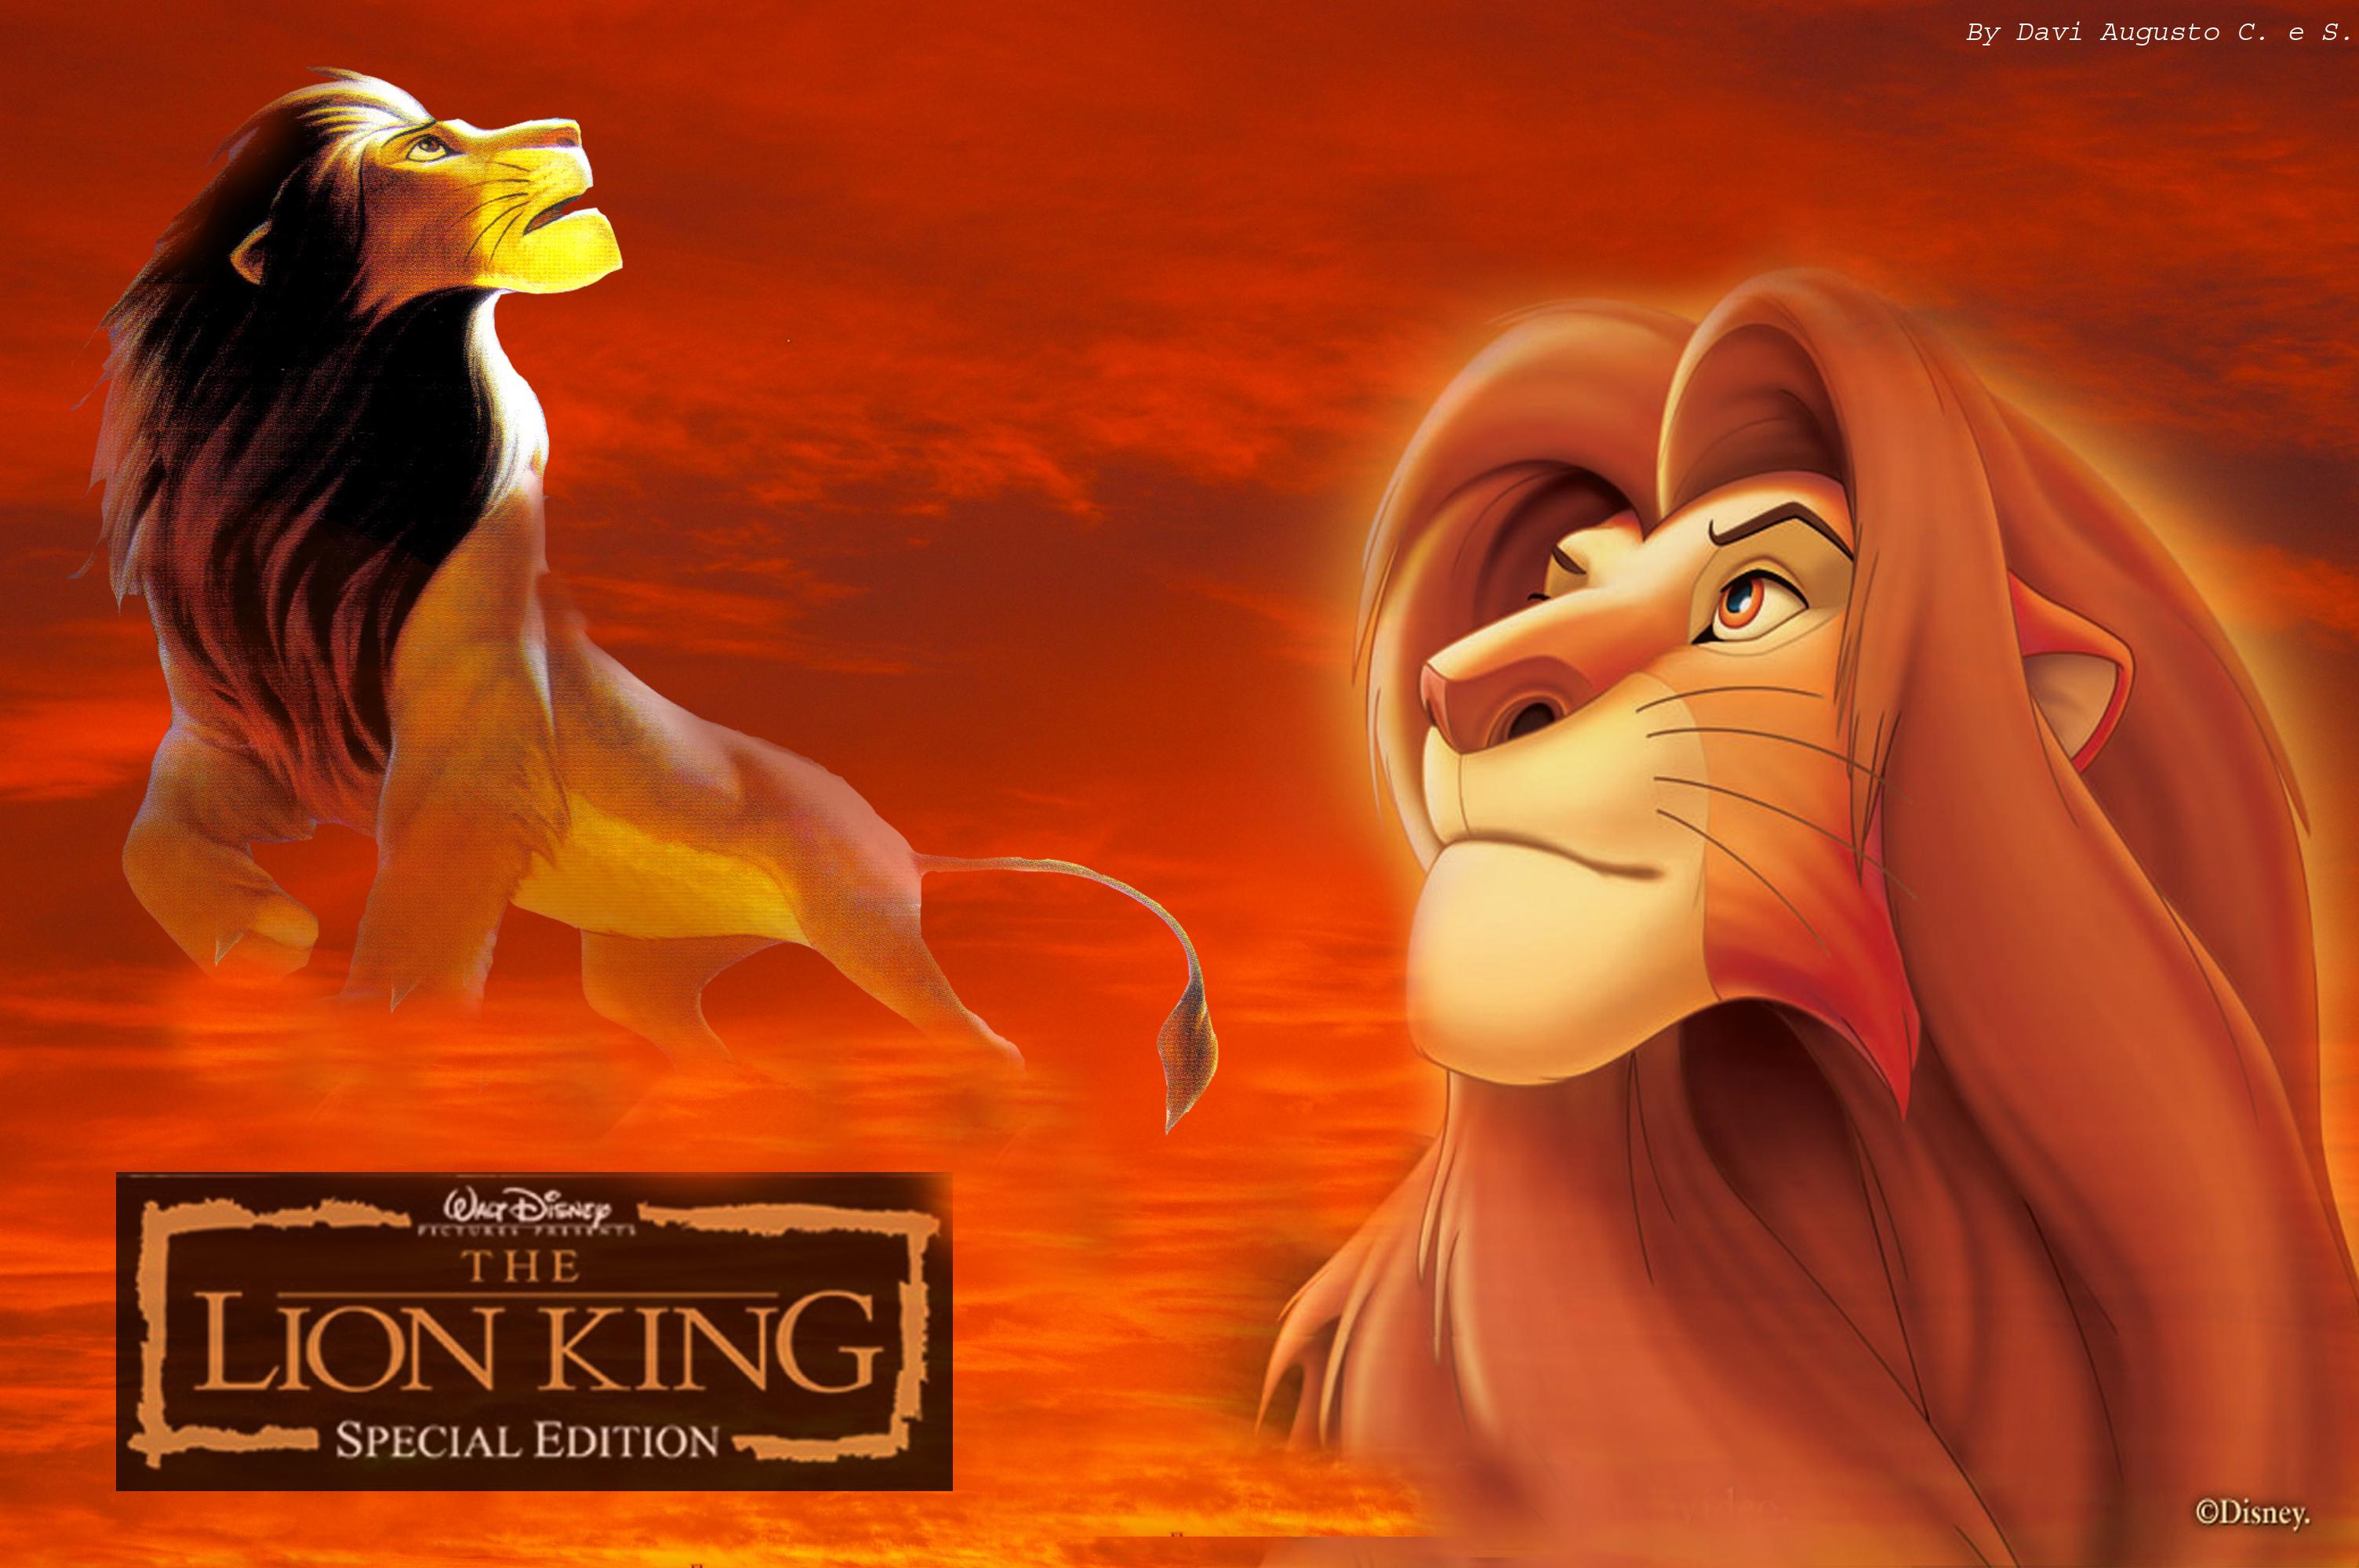 mis imagenes favoritas¡ Lion_king_wallpaper_2_by_daviskingdom-d36ogqi